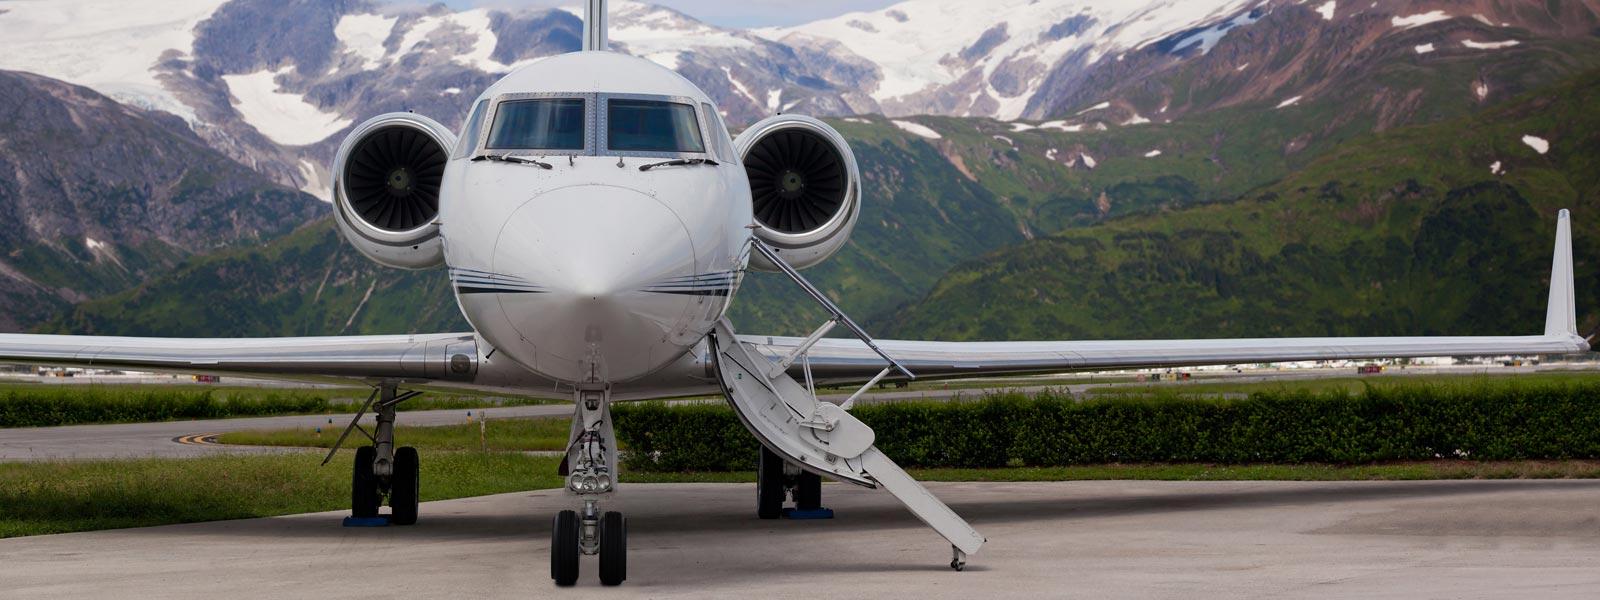 Private jet locations